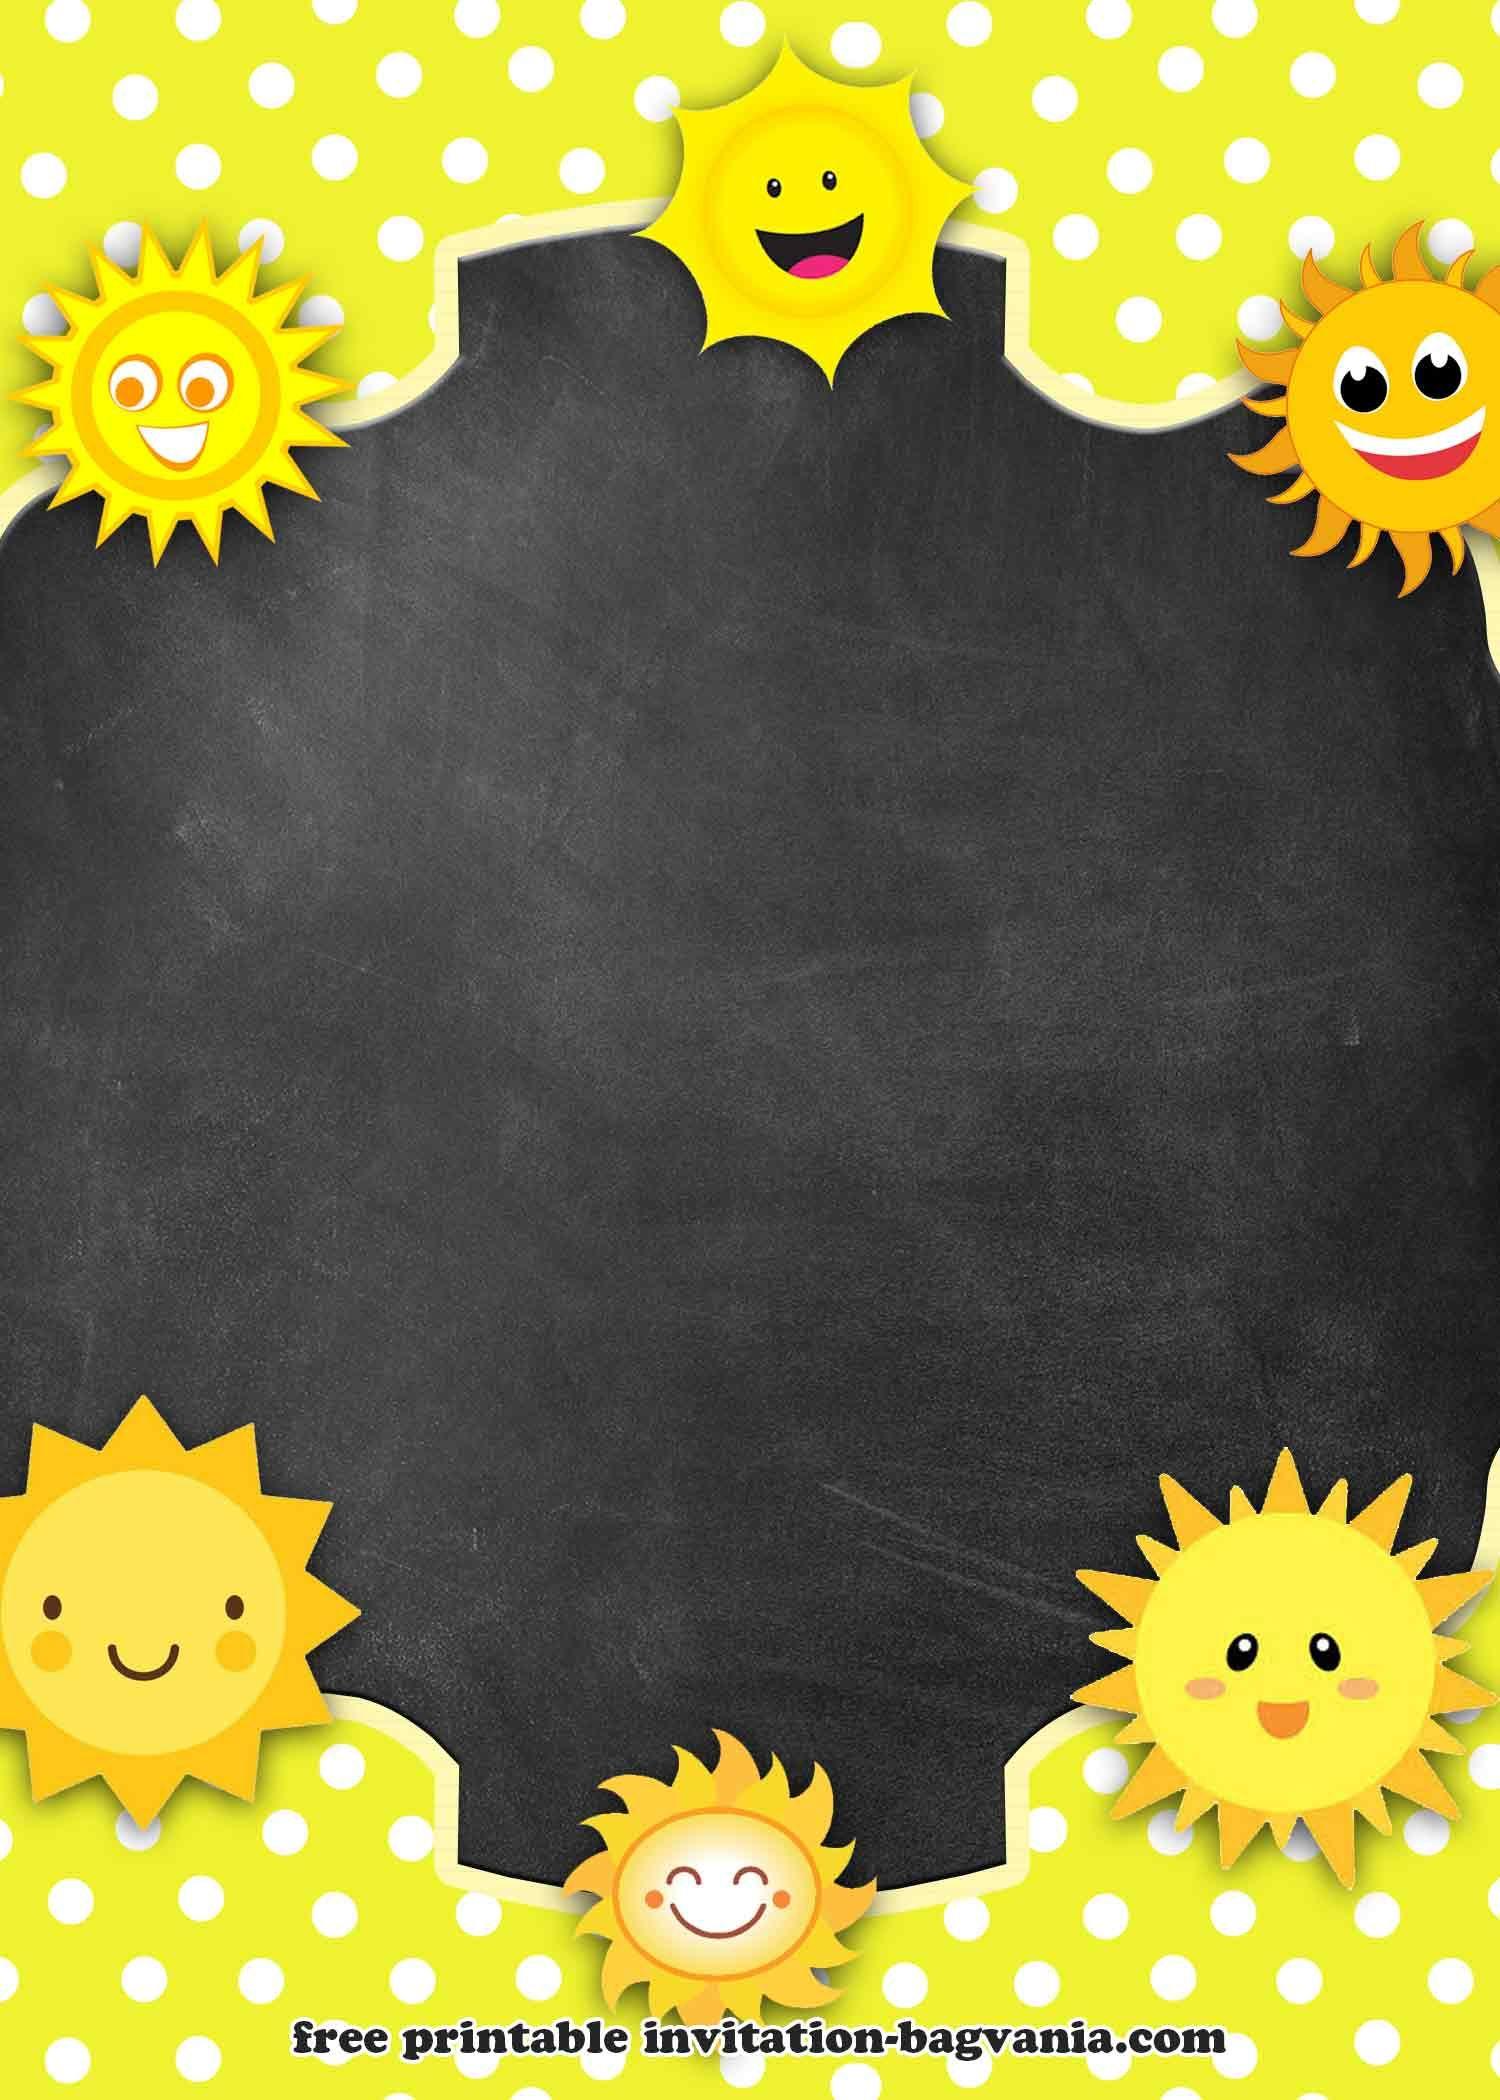 FREE Printable My Little Sunshine Invitation Templates  Printable